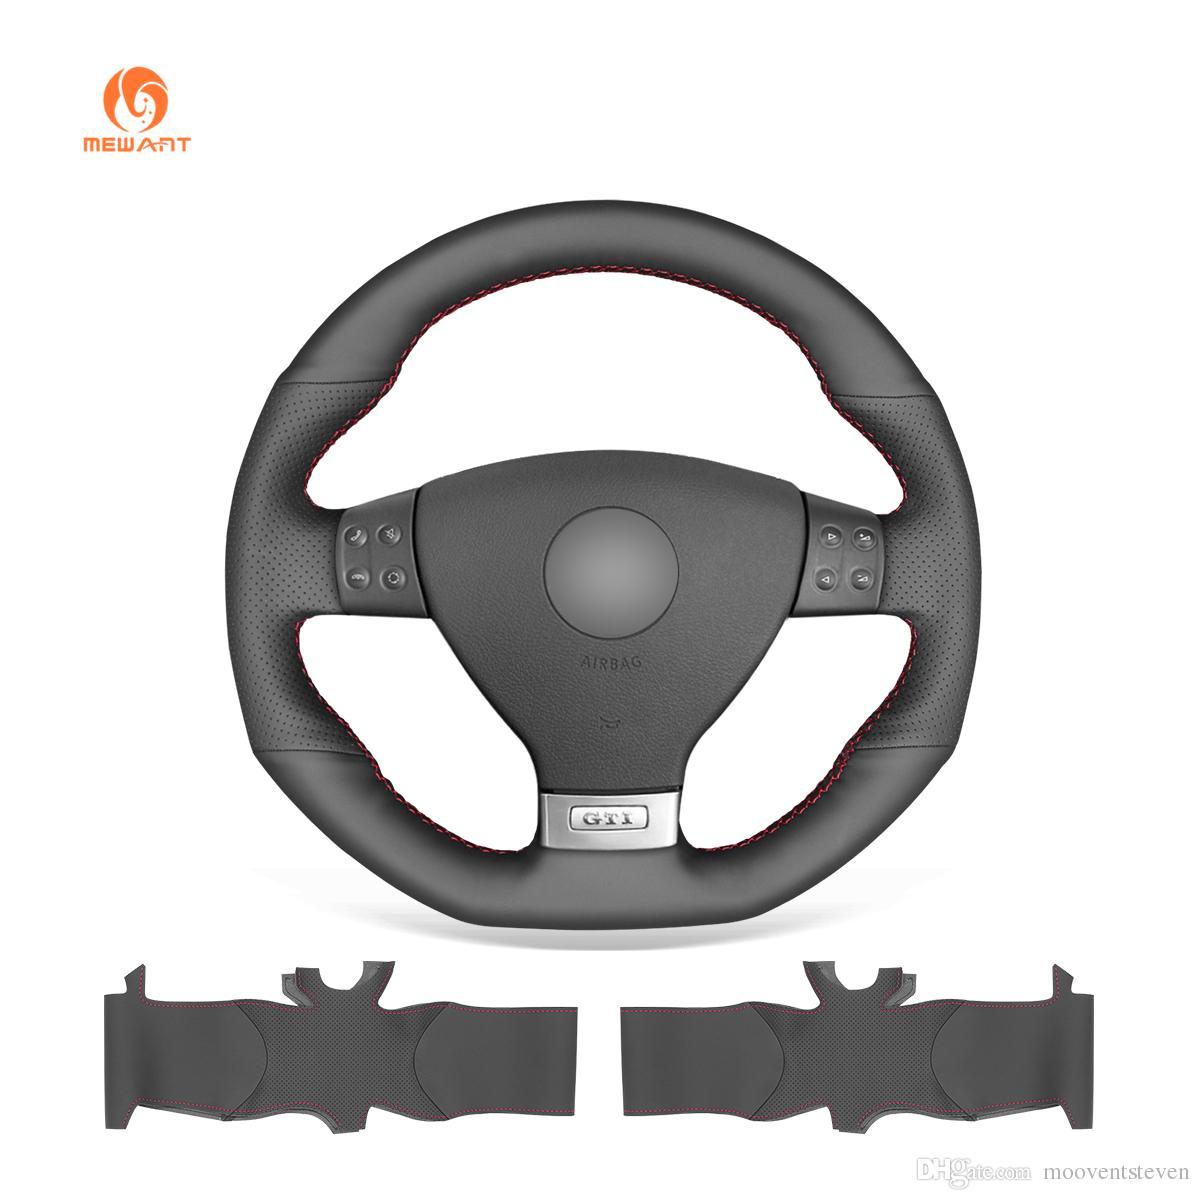 MEWANT Black Artificial Leather Car Steering Wheel Cover for Volkswagen Golf 5 Mk5 GTI VW Golf 5 R32 Passat R GT 2005